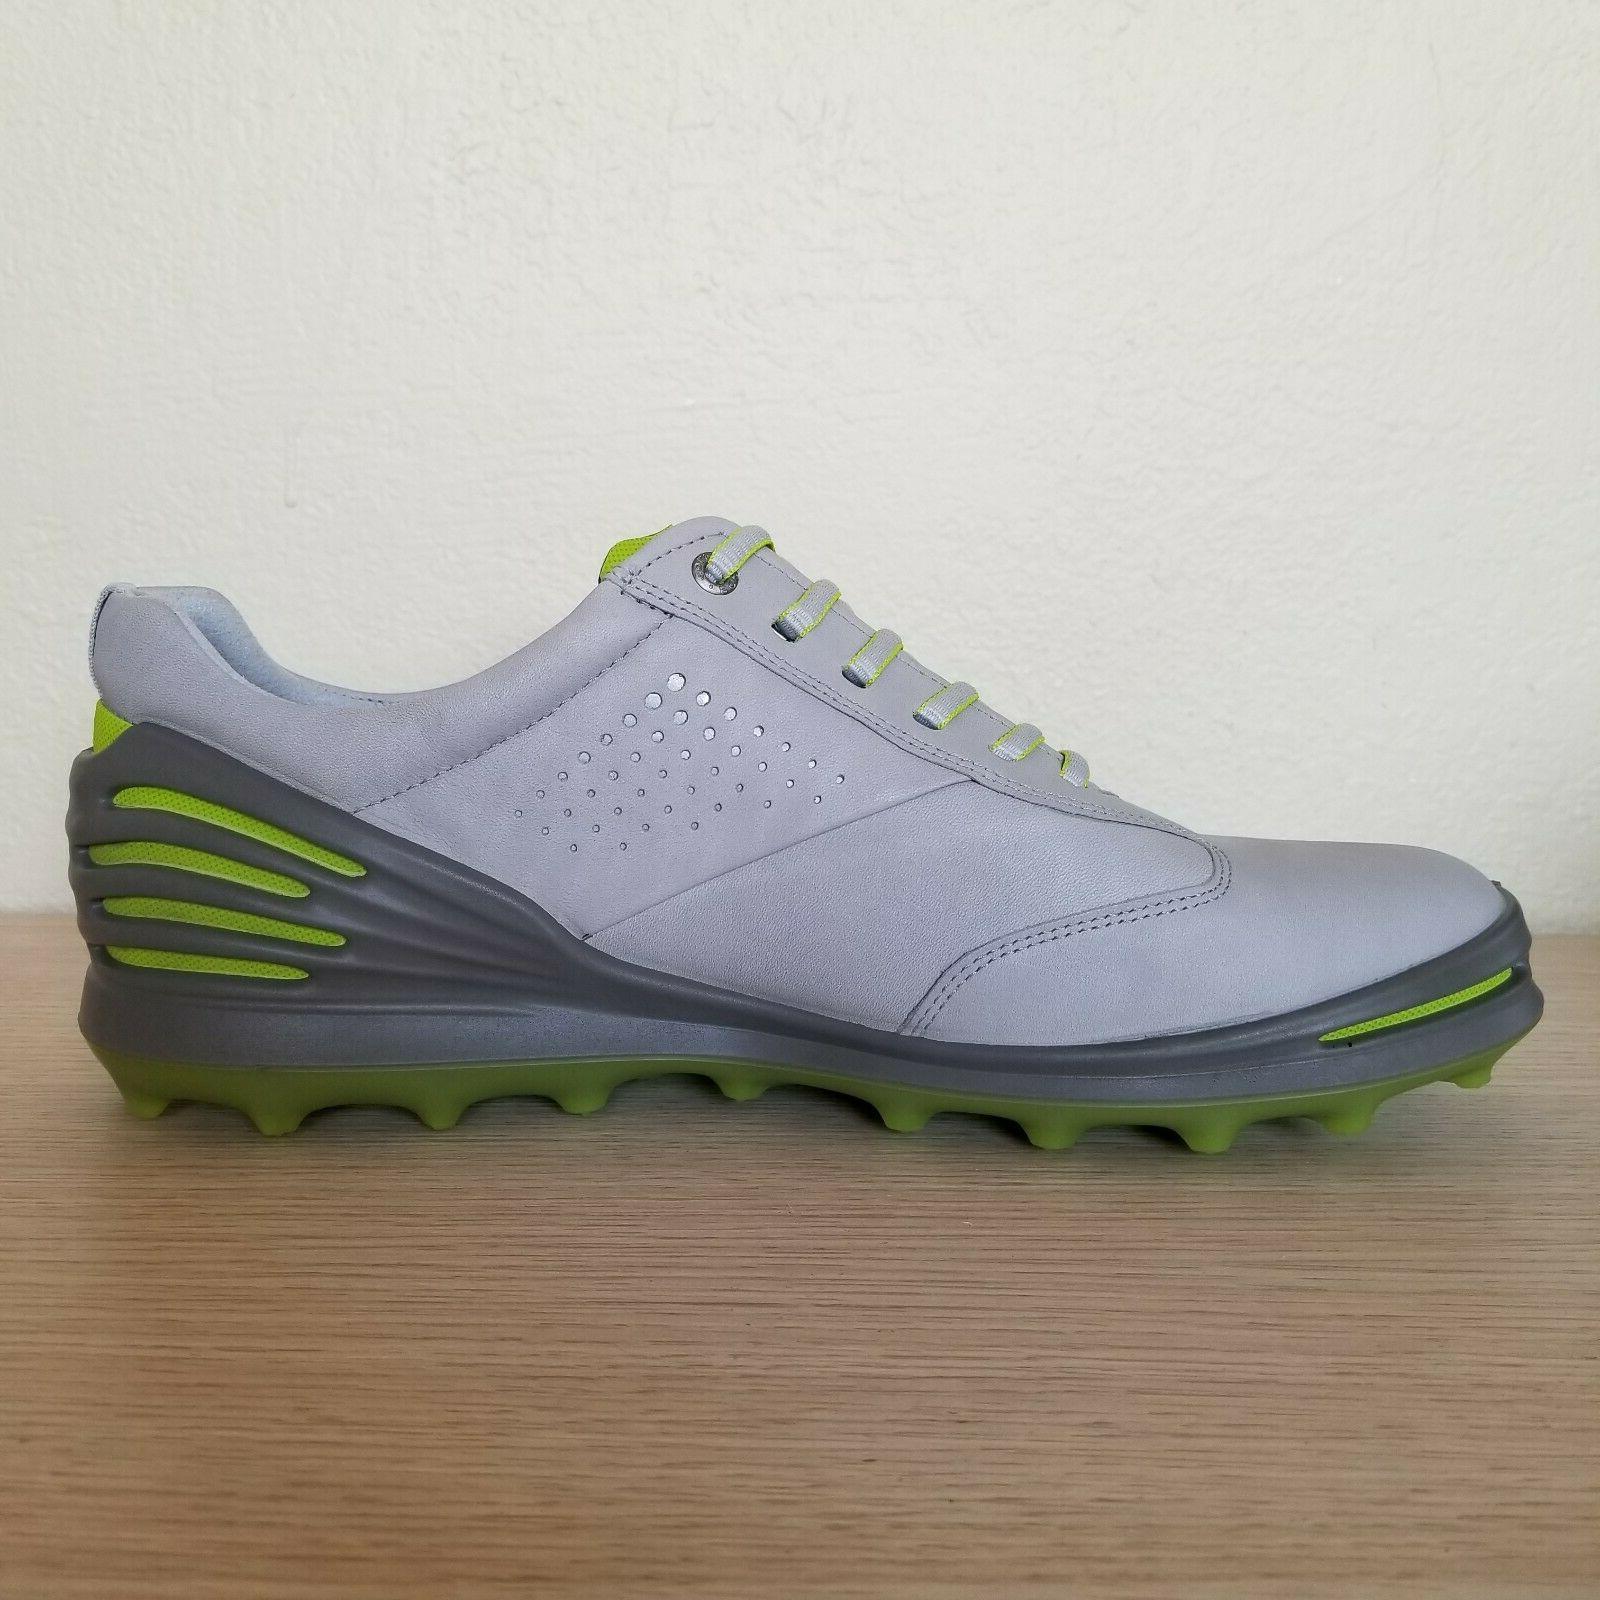 ECCO Golf Pro Spikeless Golf Concrete Gray Green SZ